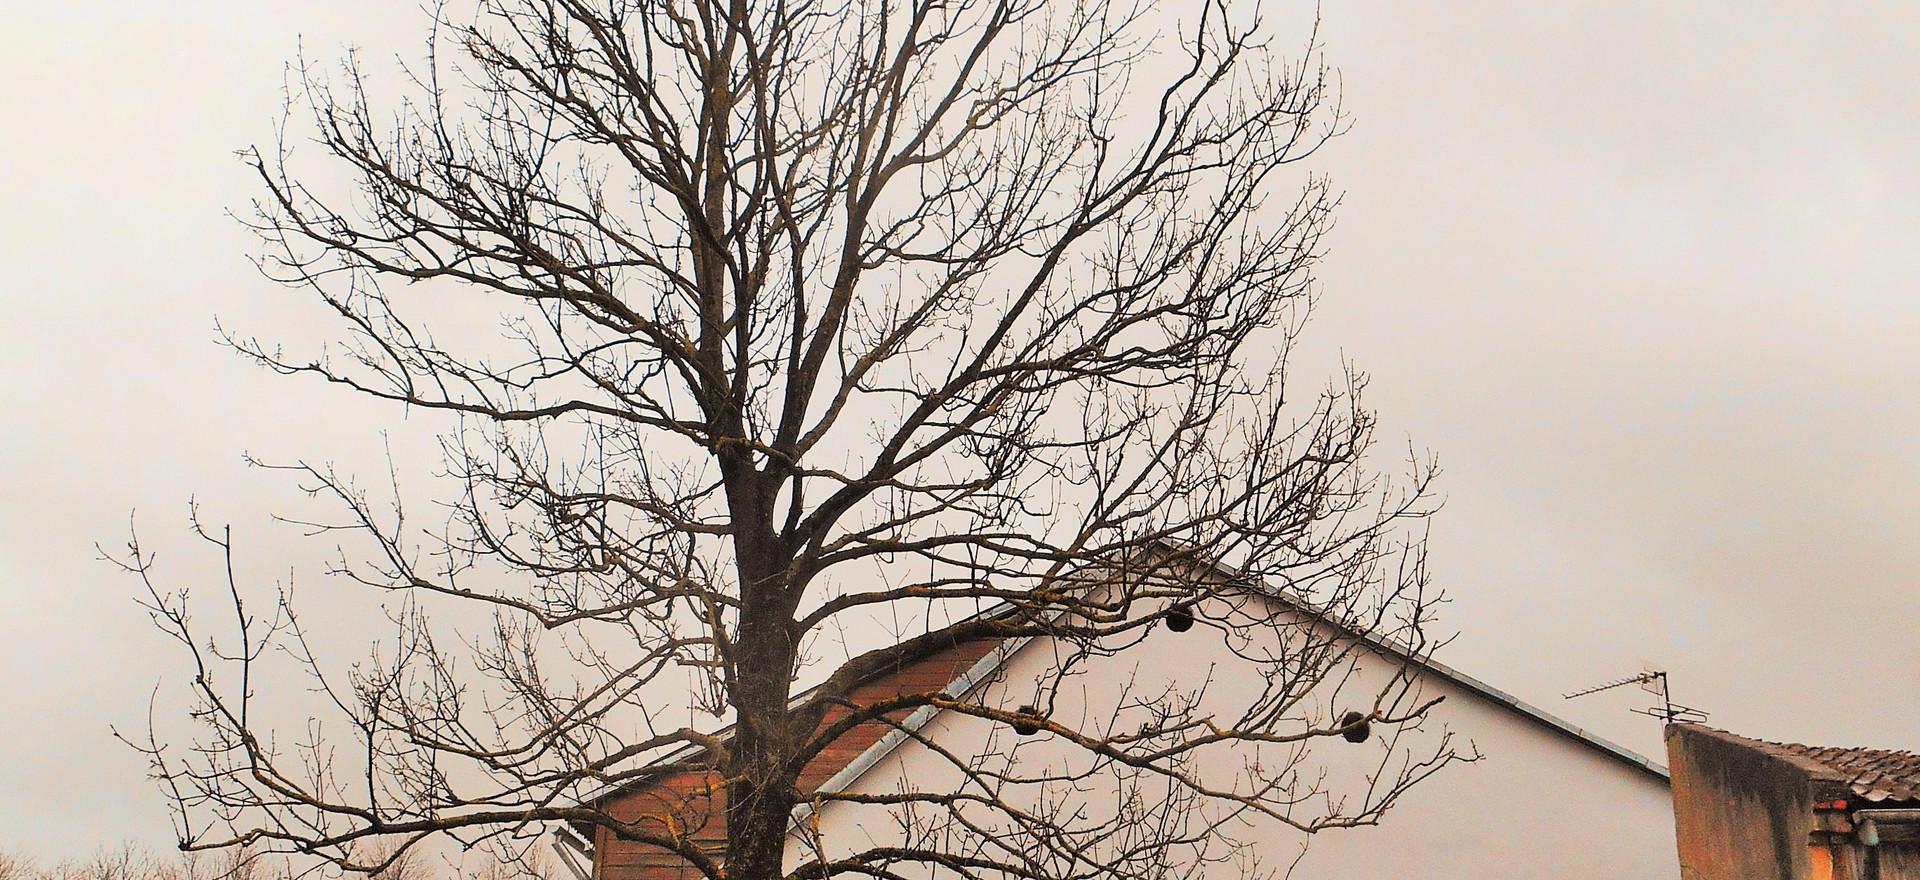 Selfportrait in silence, Kuldiga, April 2017